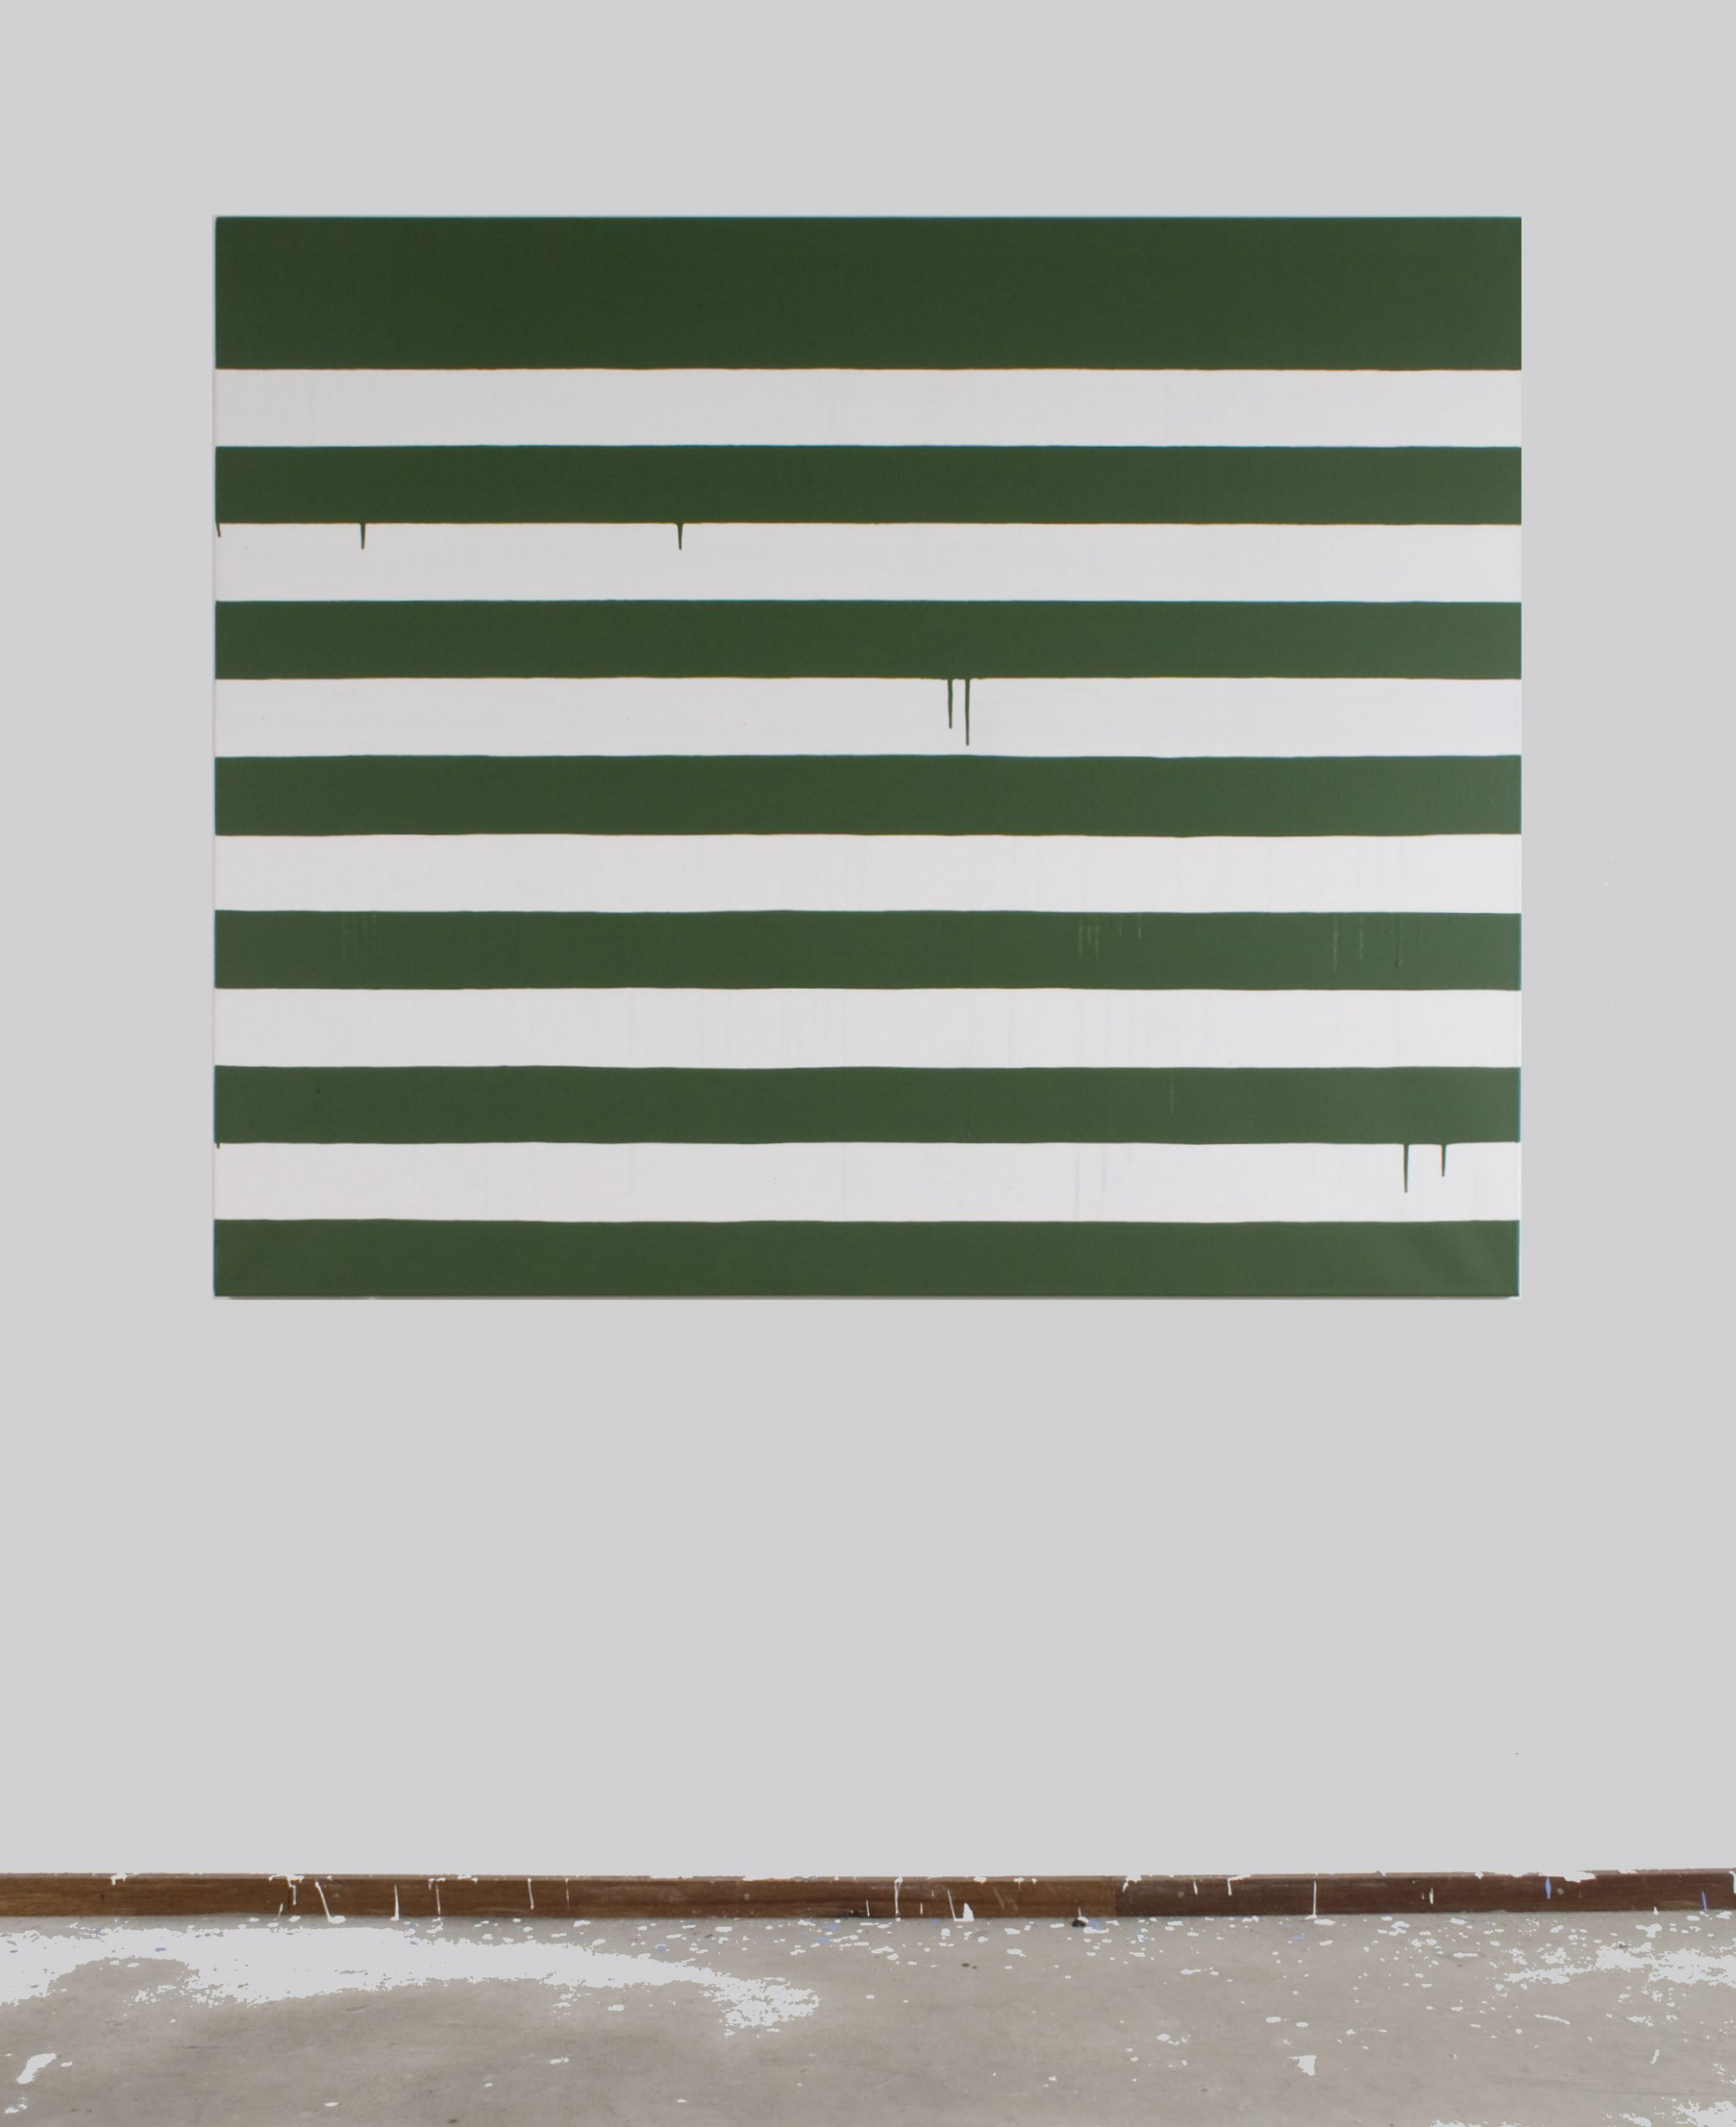 Green Order